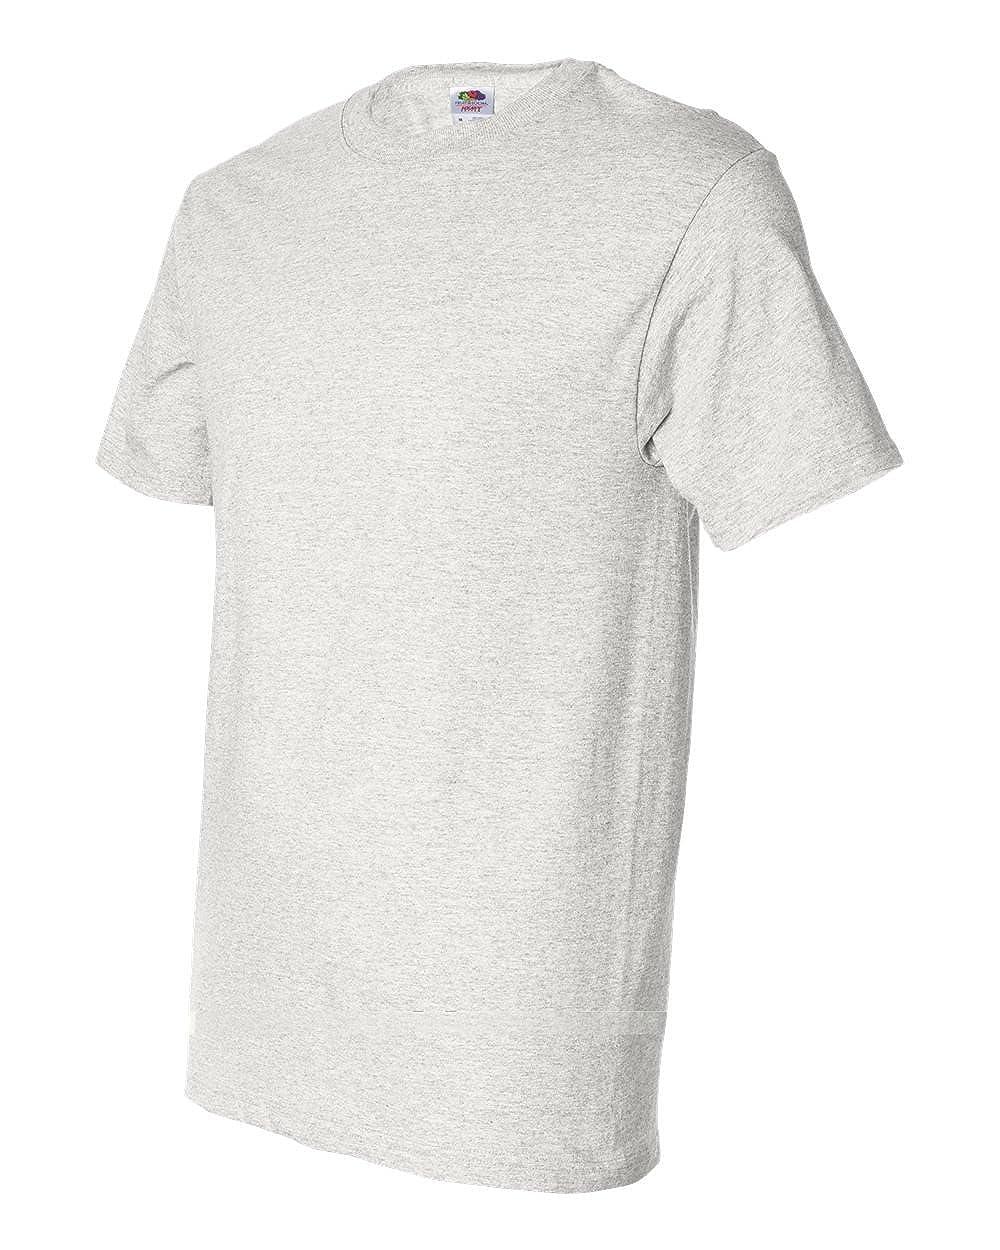 1918dfb6ef5e Fruit of the Loom Men s Seamless Lightweight T-Shirt